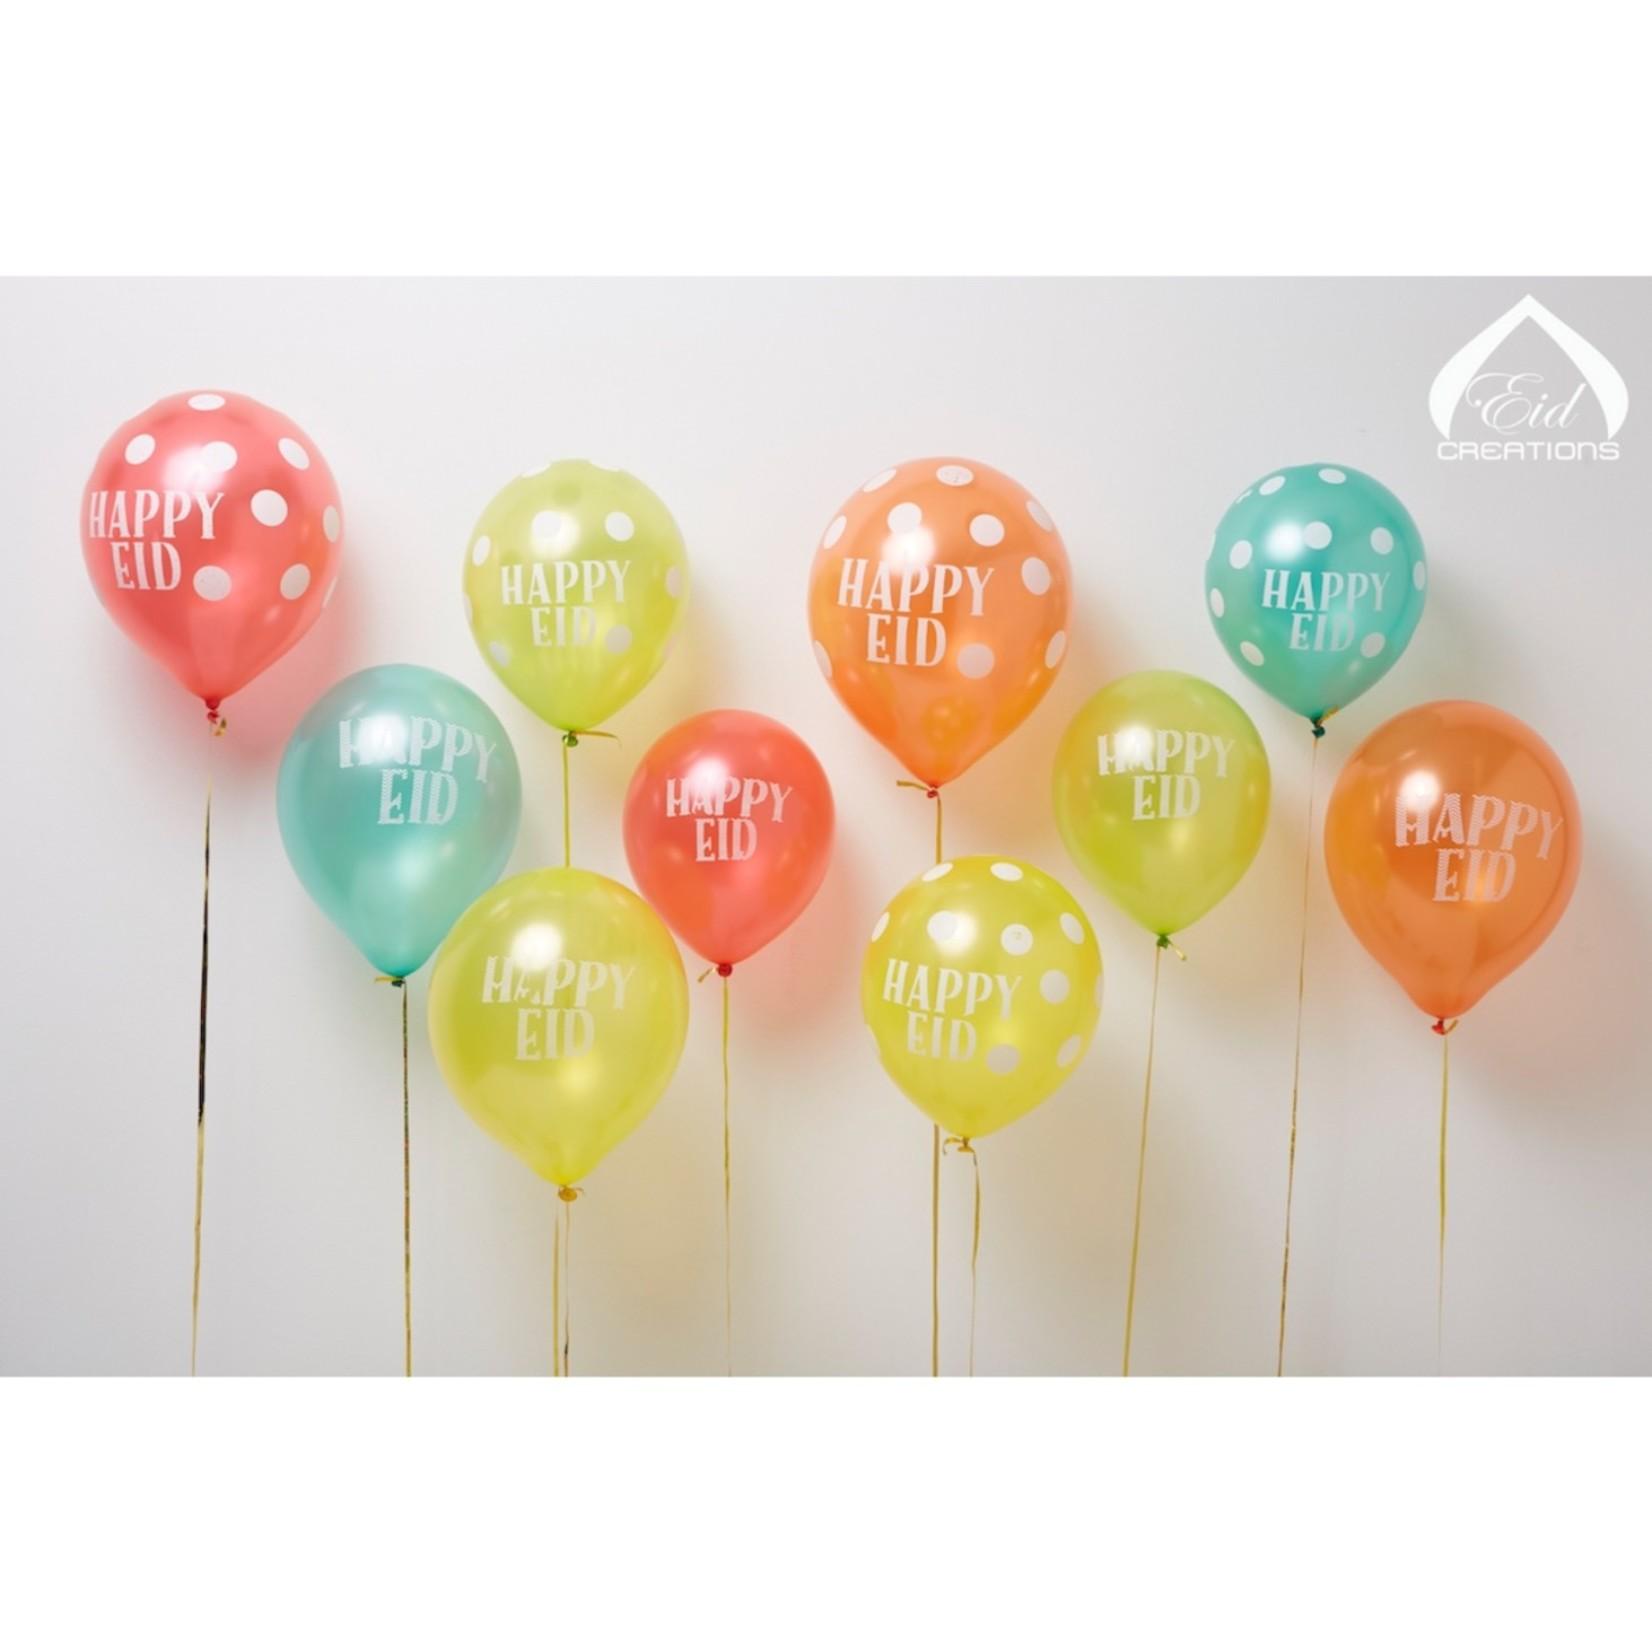 Eid Creations Happy Eid Balloons